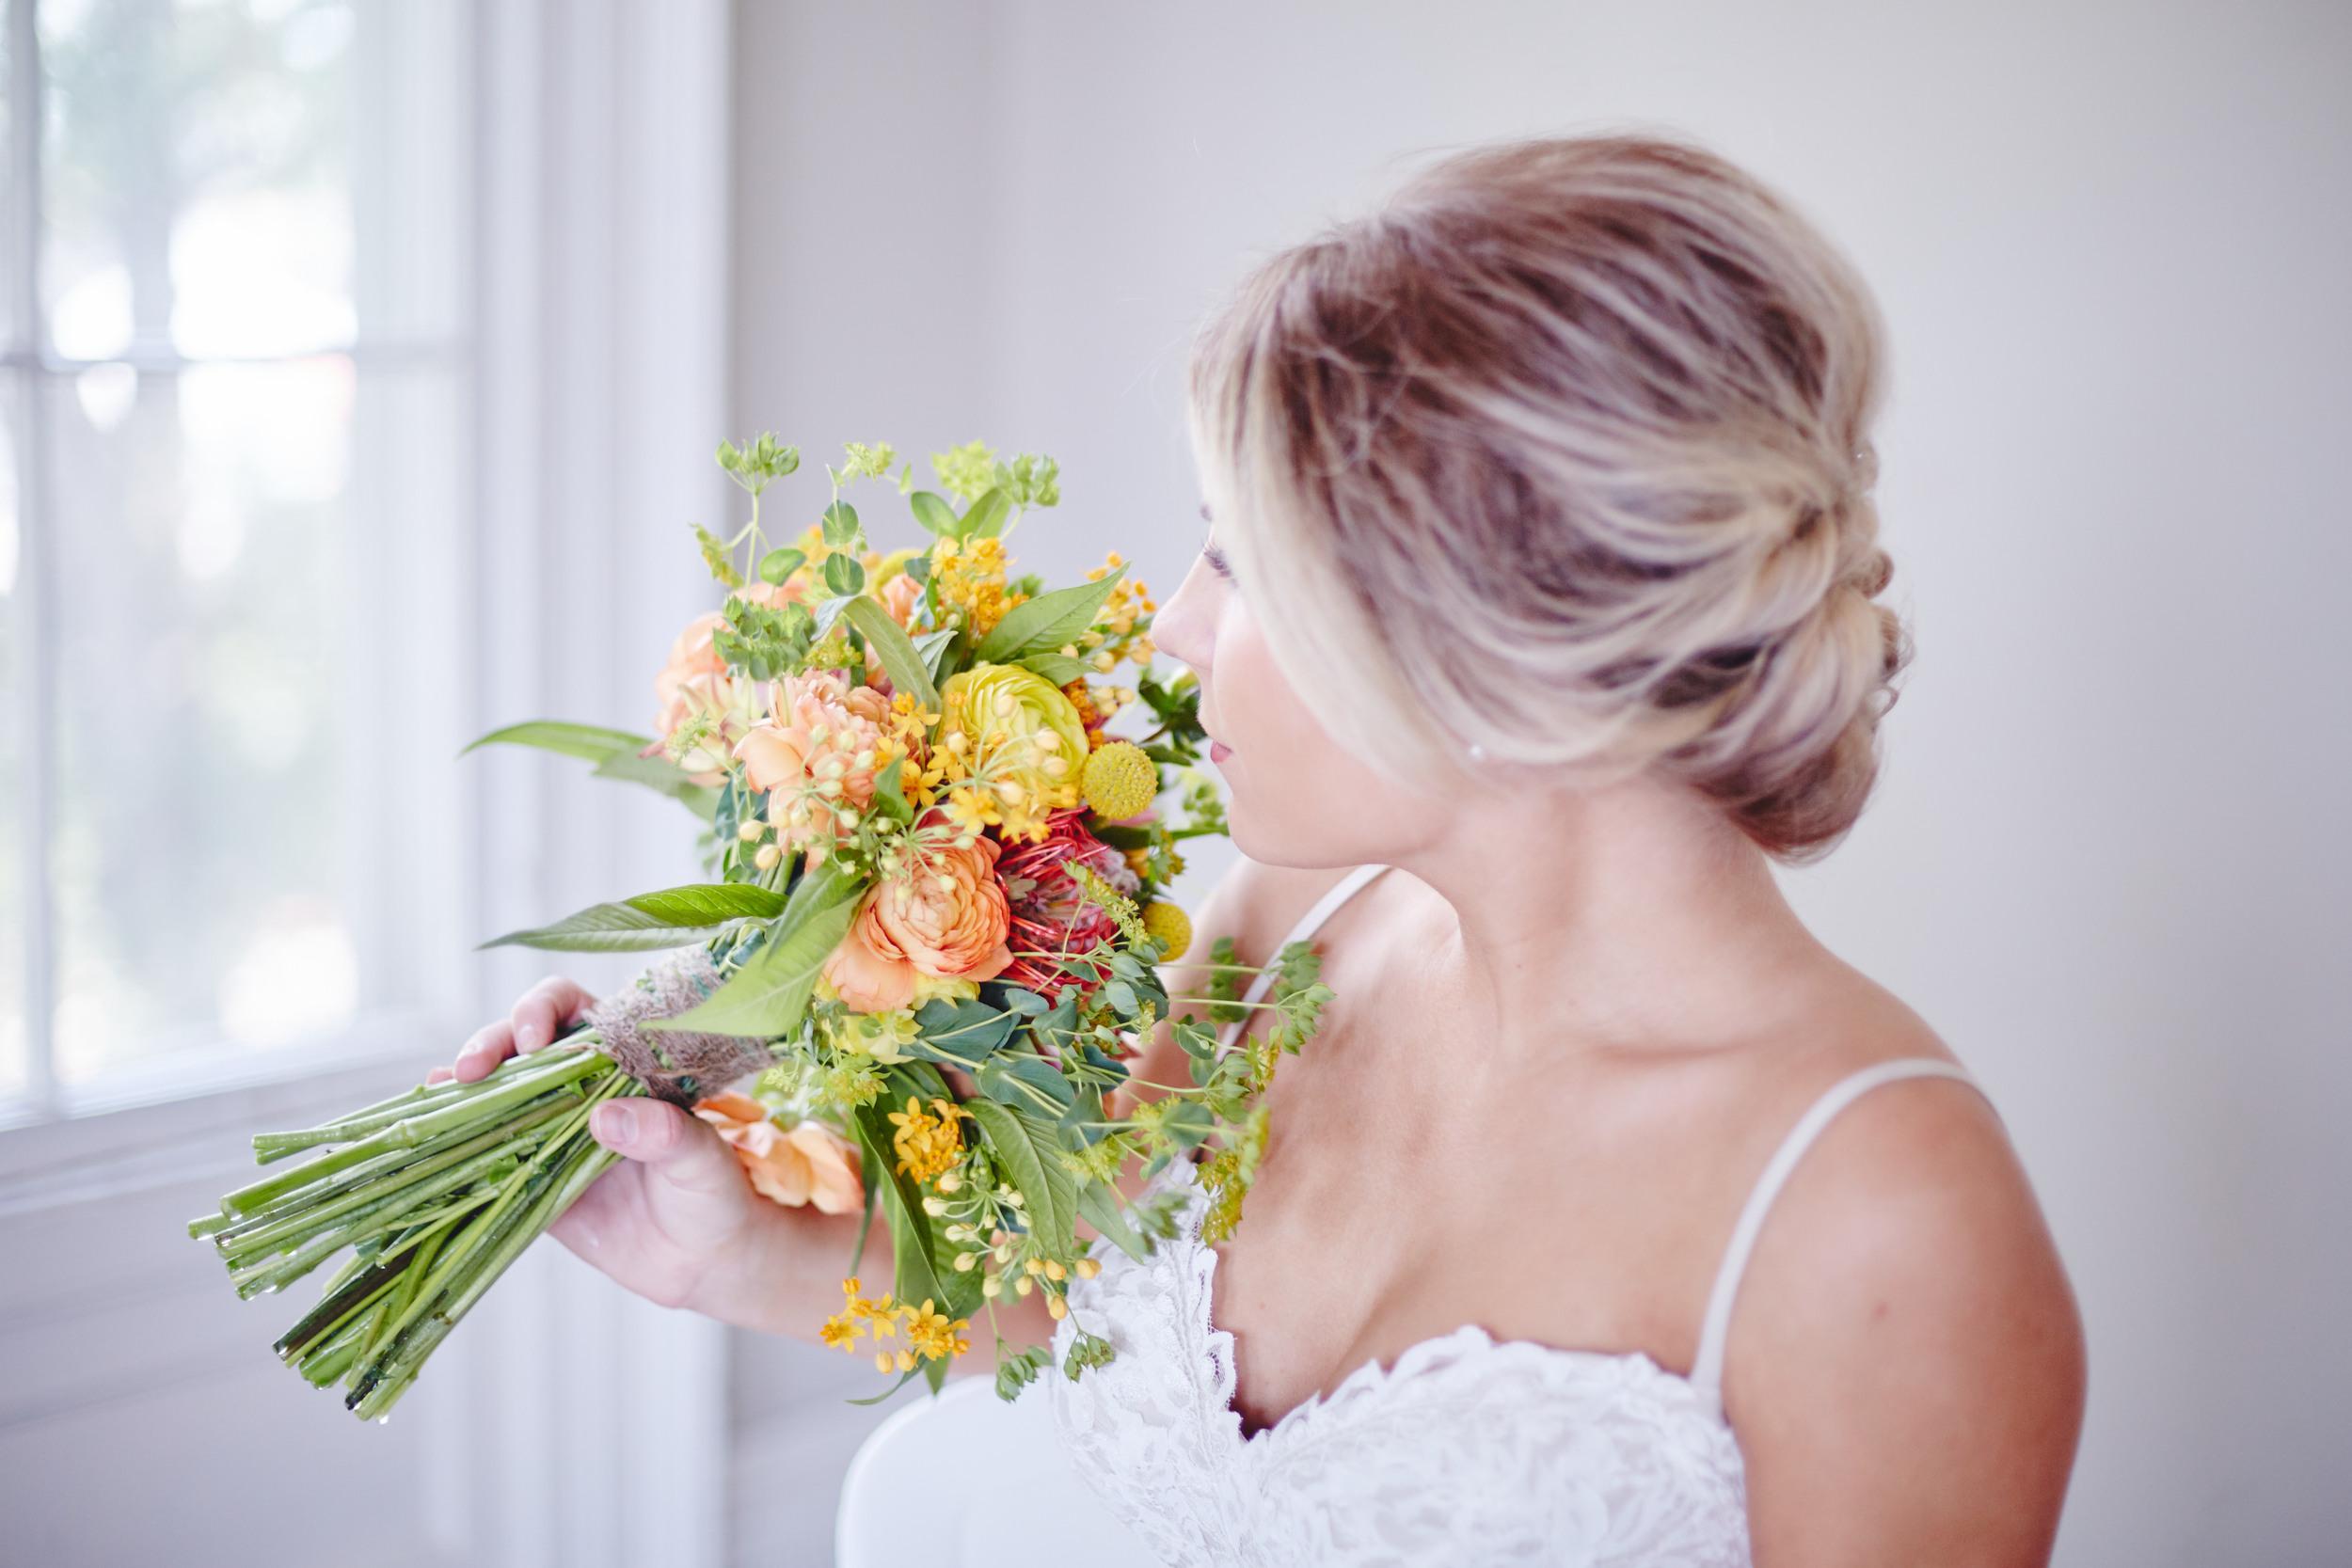 Styled_Session_Becca_Bridal_Portraits_Sarah_Tau_Photography_HOB_Studio_285 71.jpg